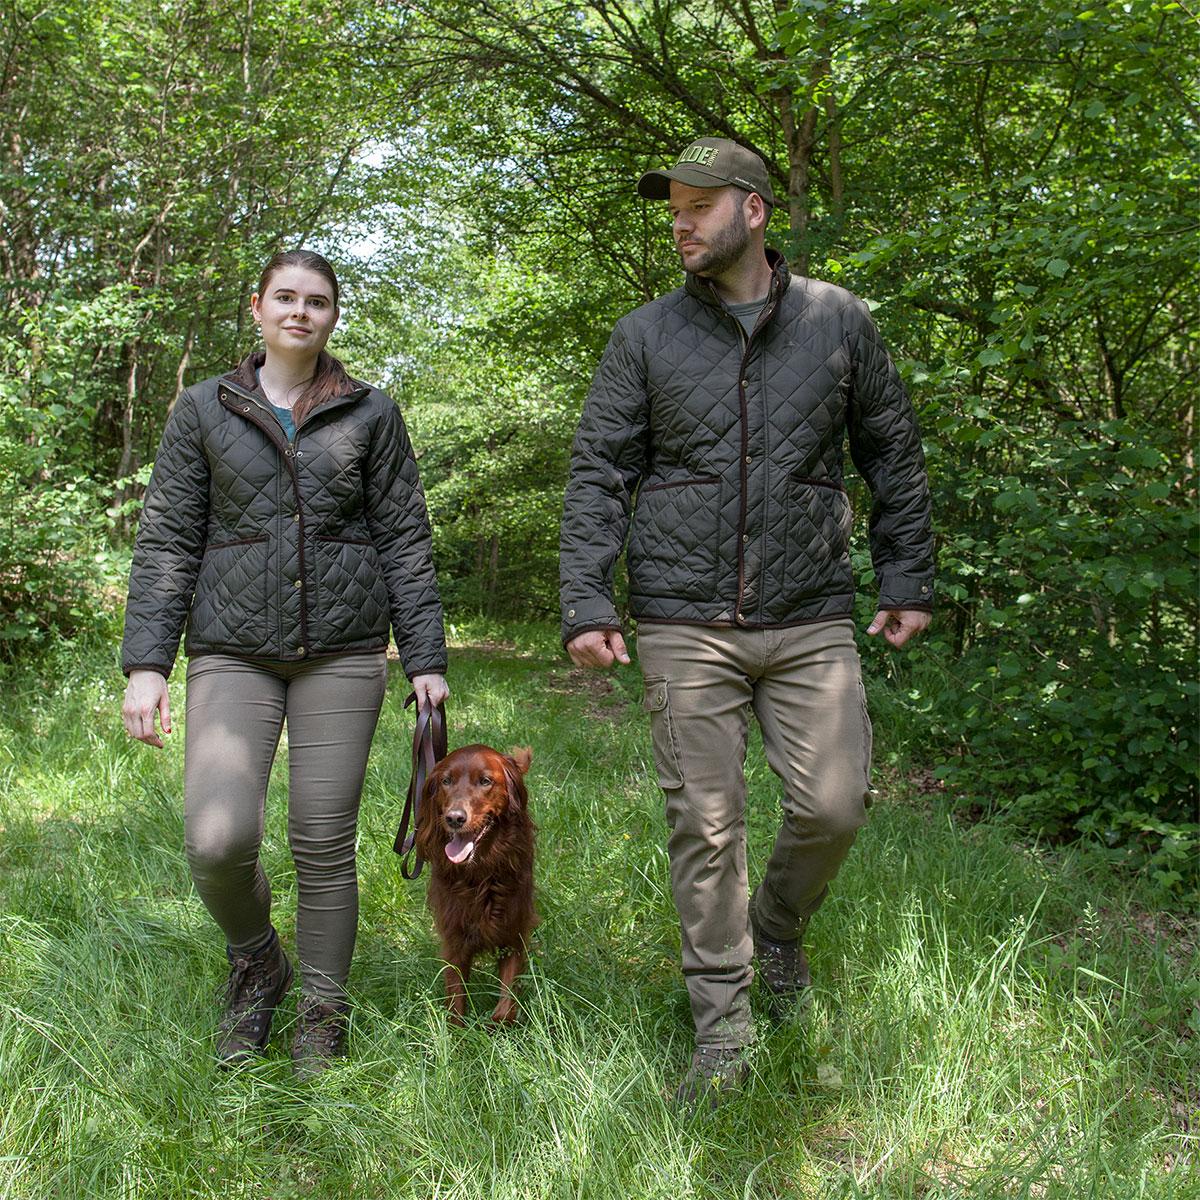 Pinewood Damen-Jacke Yorkshire Moosgrün im Pareyshop